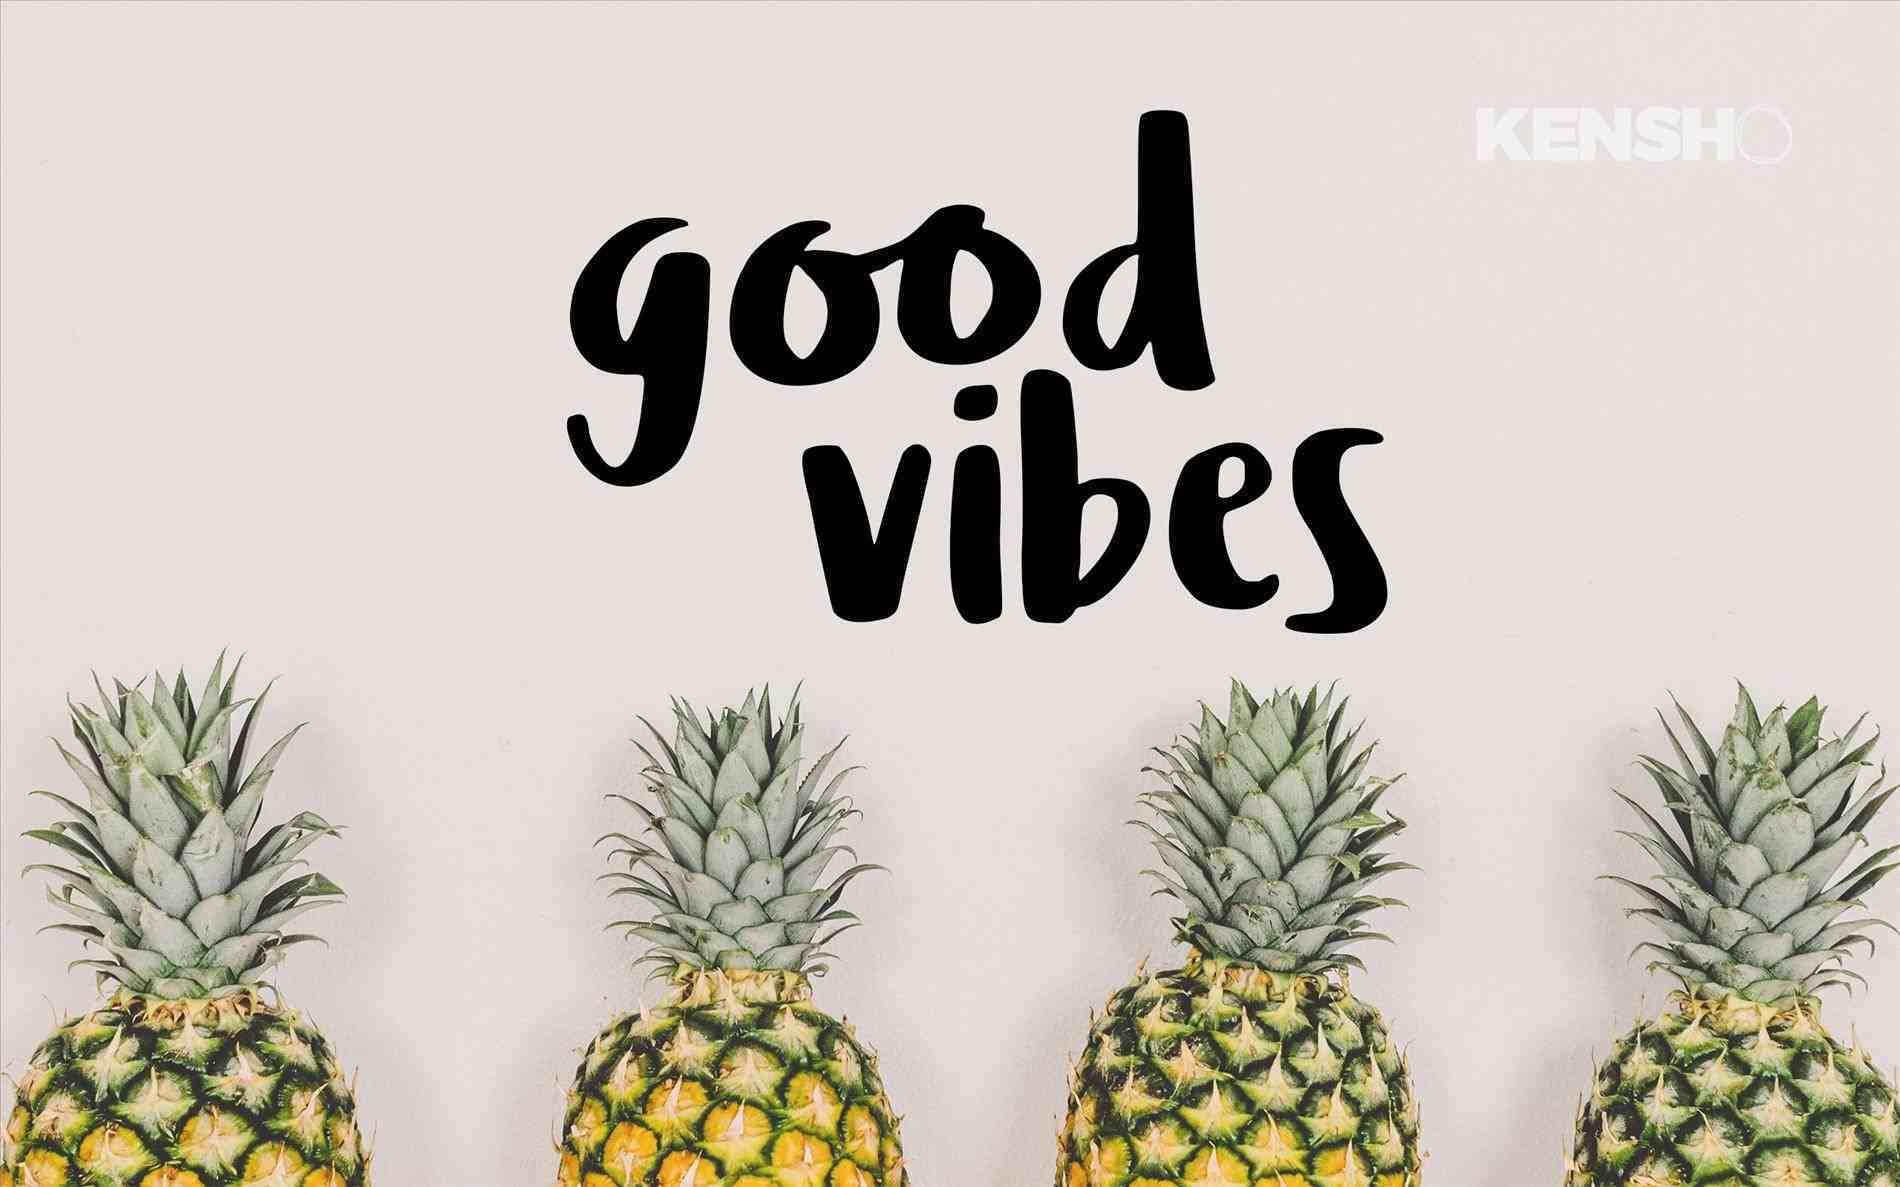 Pineapple Good Vibes Desktop 2245137 Hd Wallpaper Backgrounds Download